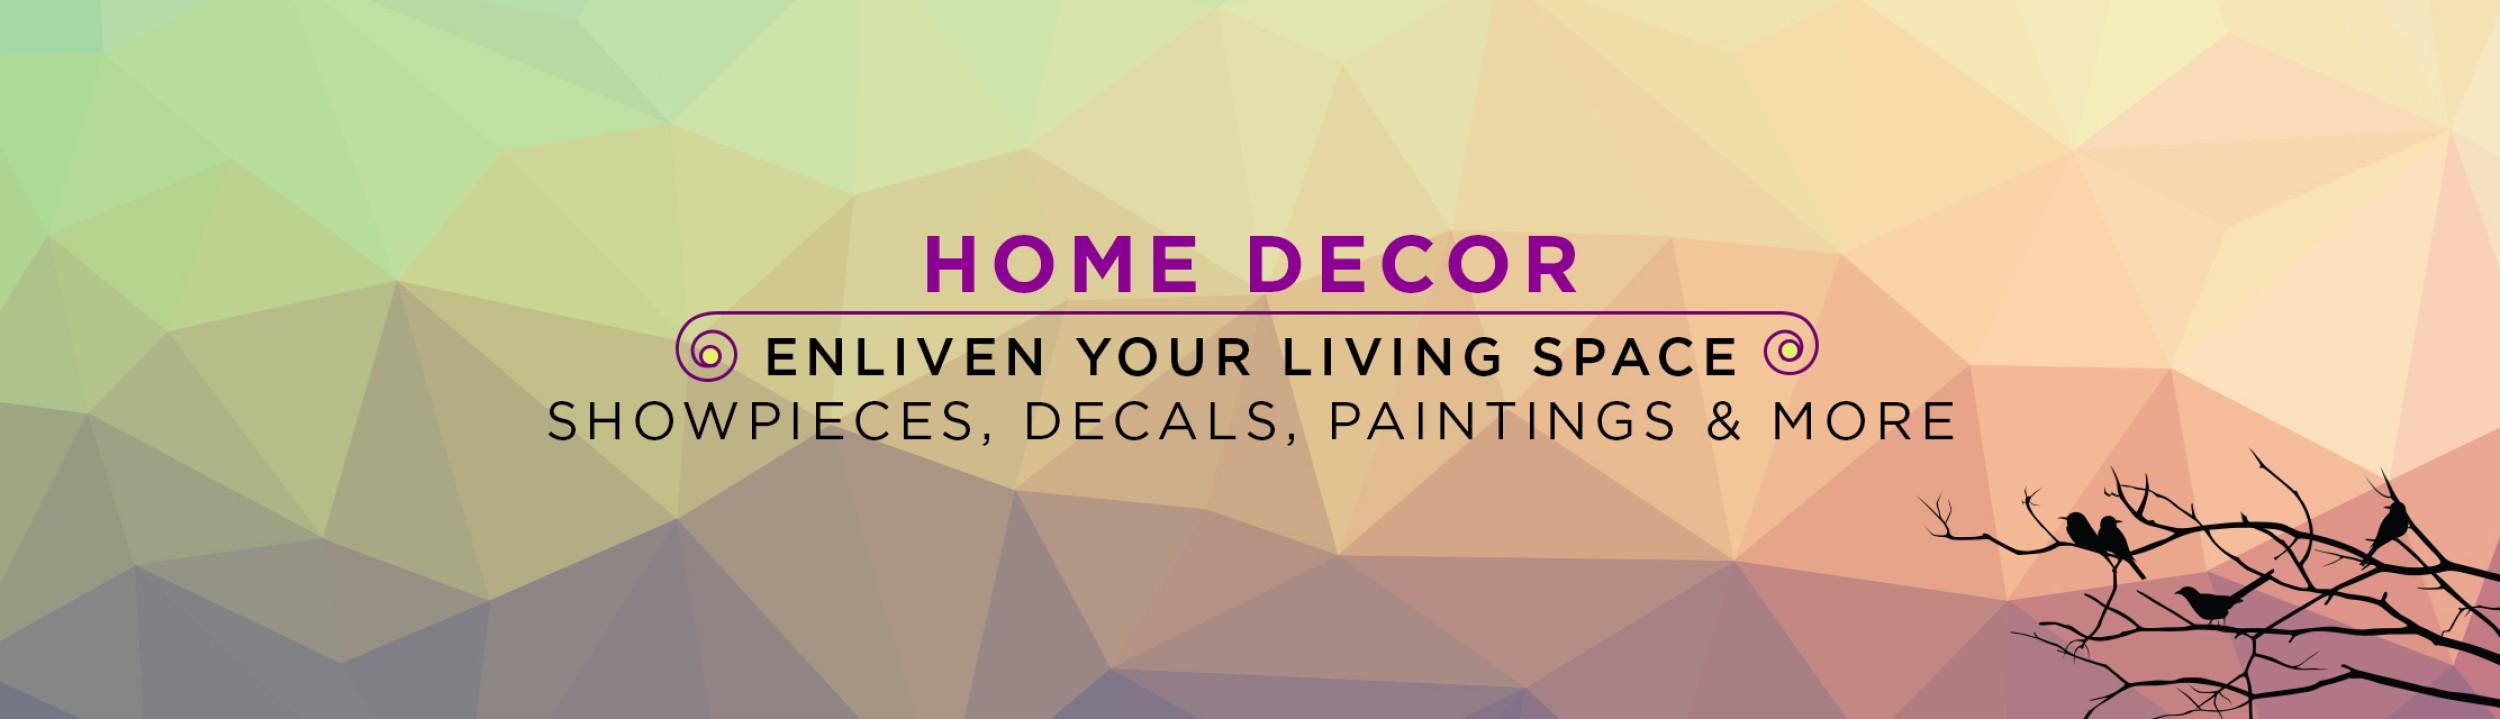 Home Decor Range Home Decor